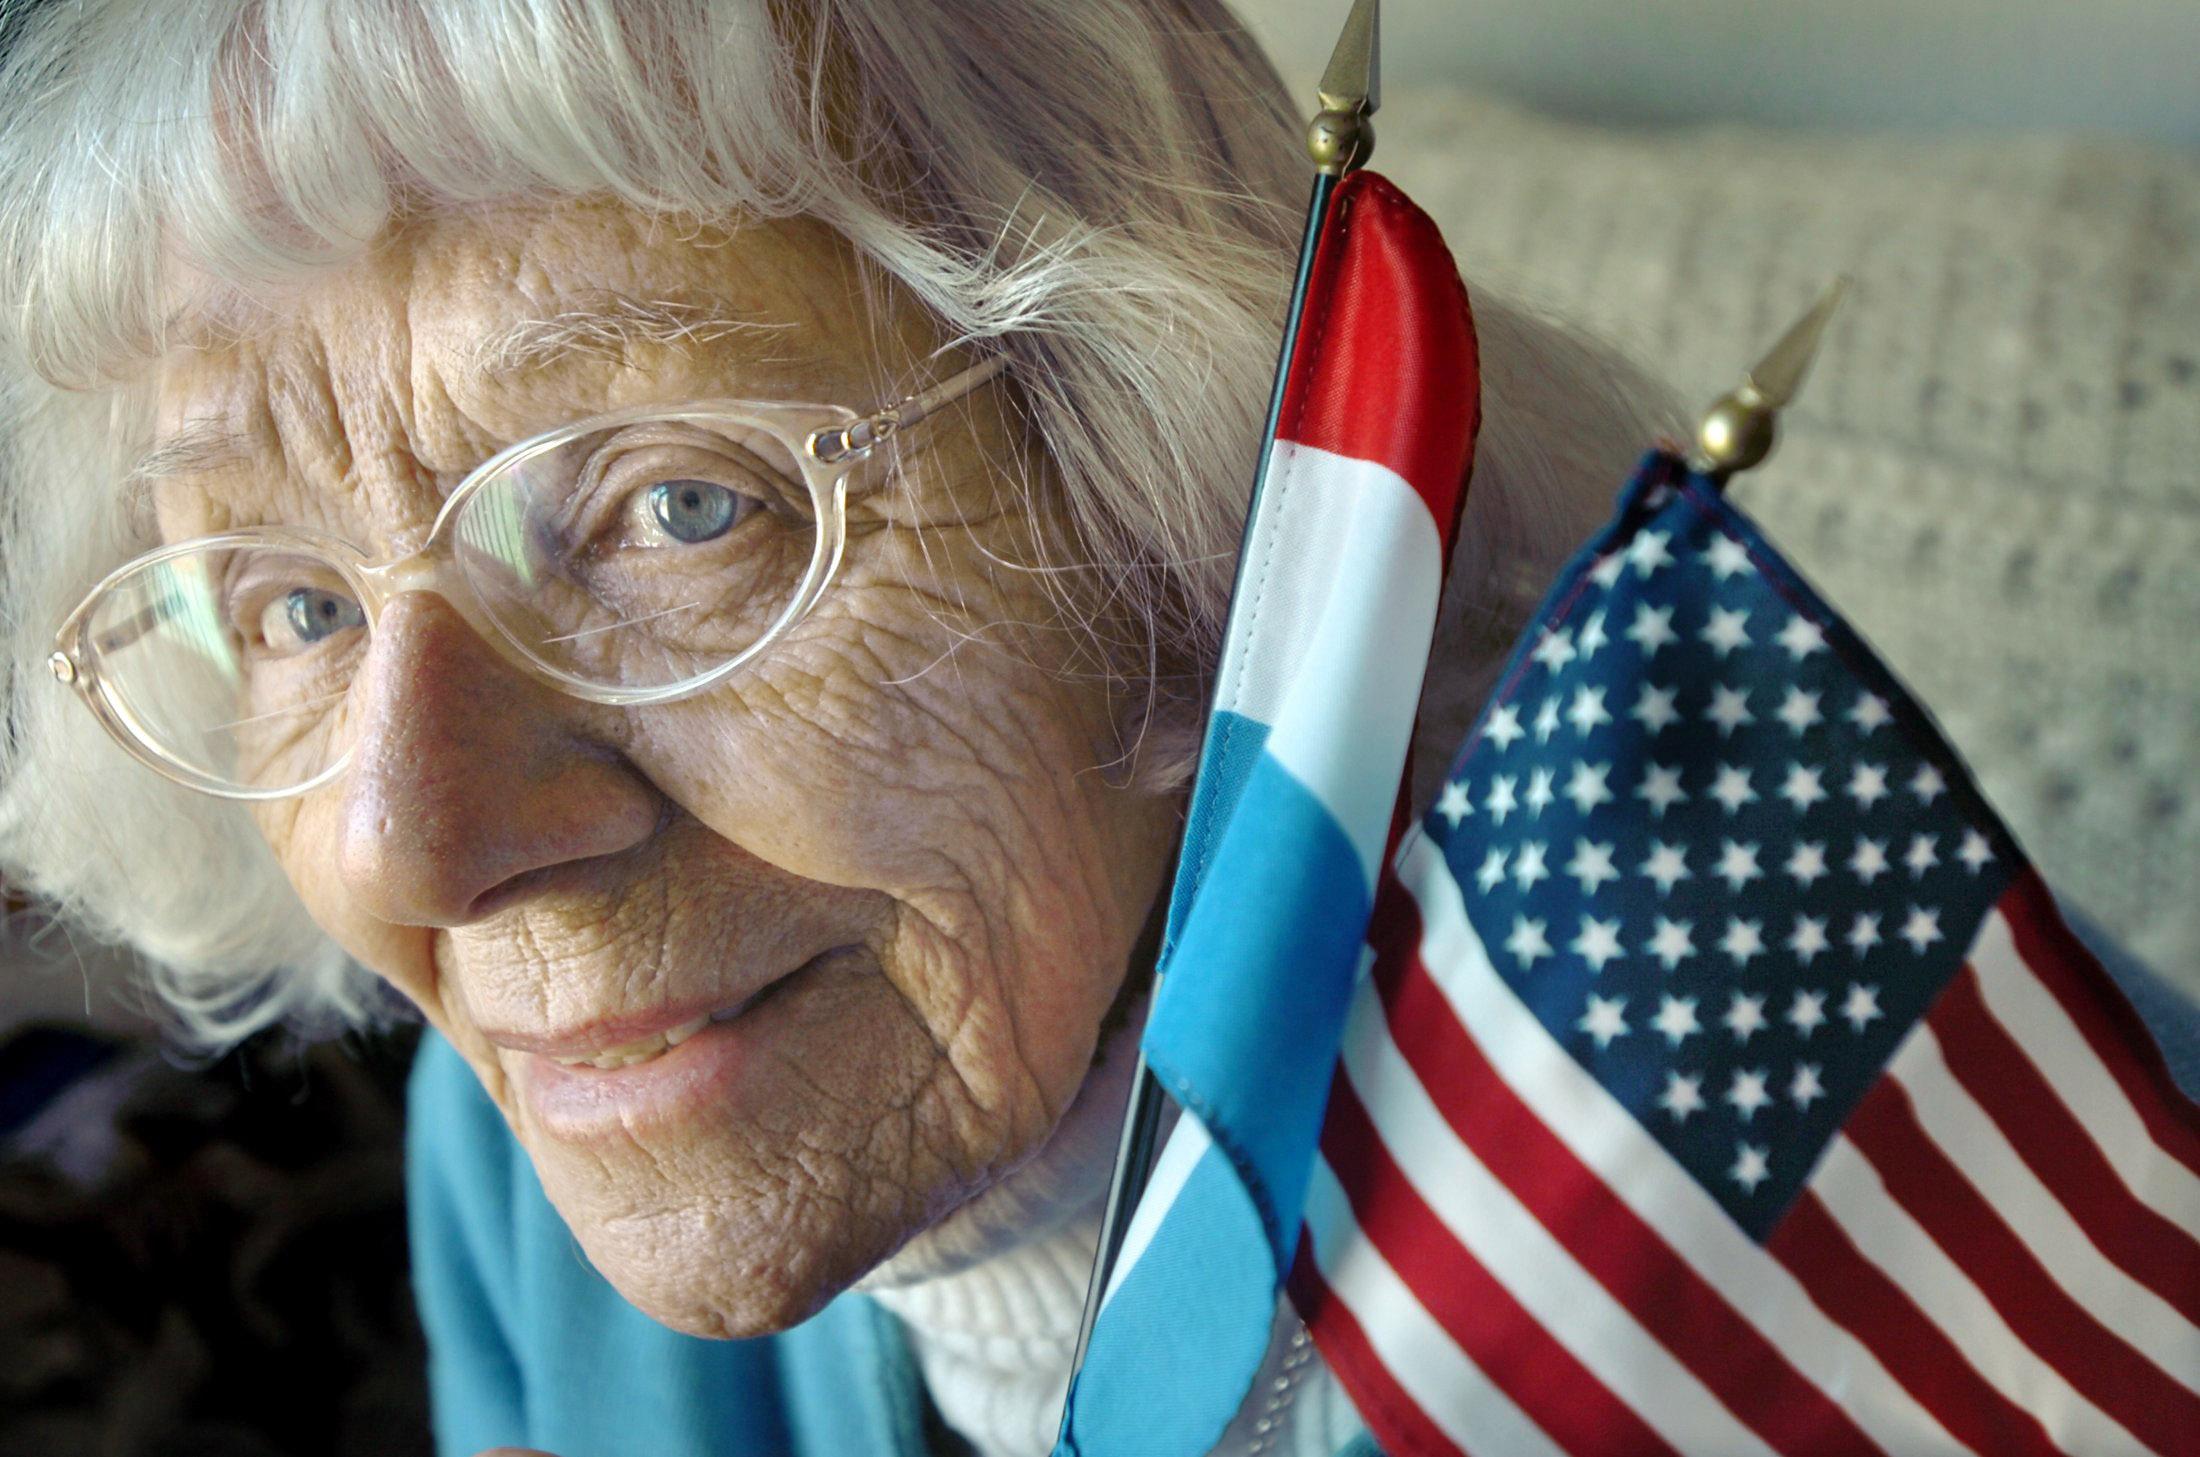 Diet Eman, Dutch Resistance hero who saved Jews during World